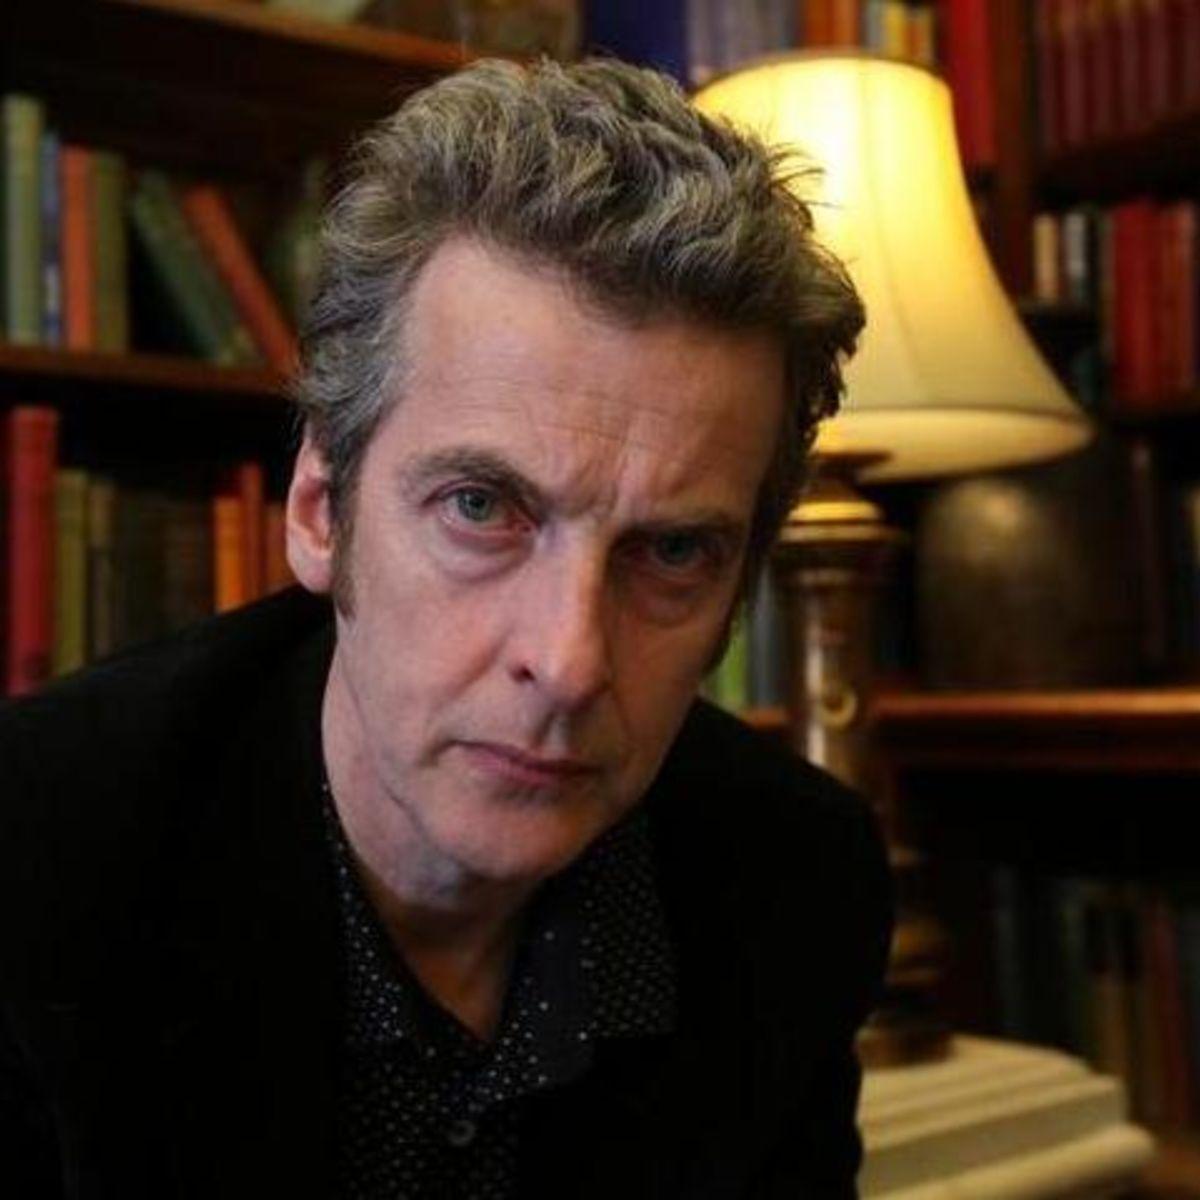 Peter-Capaldi-the-twelfth-doctor-35227063-721-480.jpg